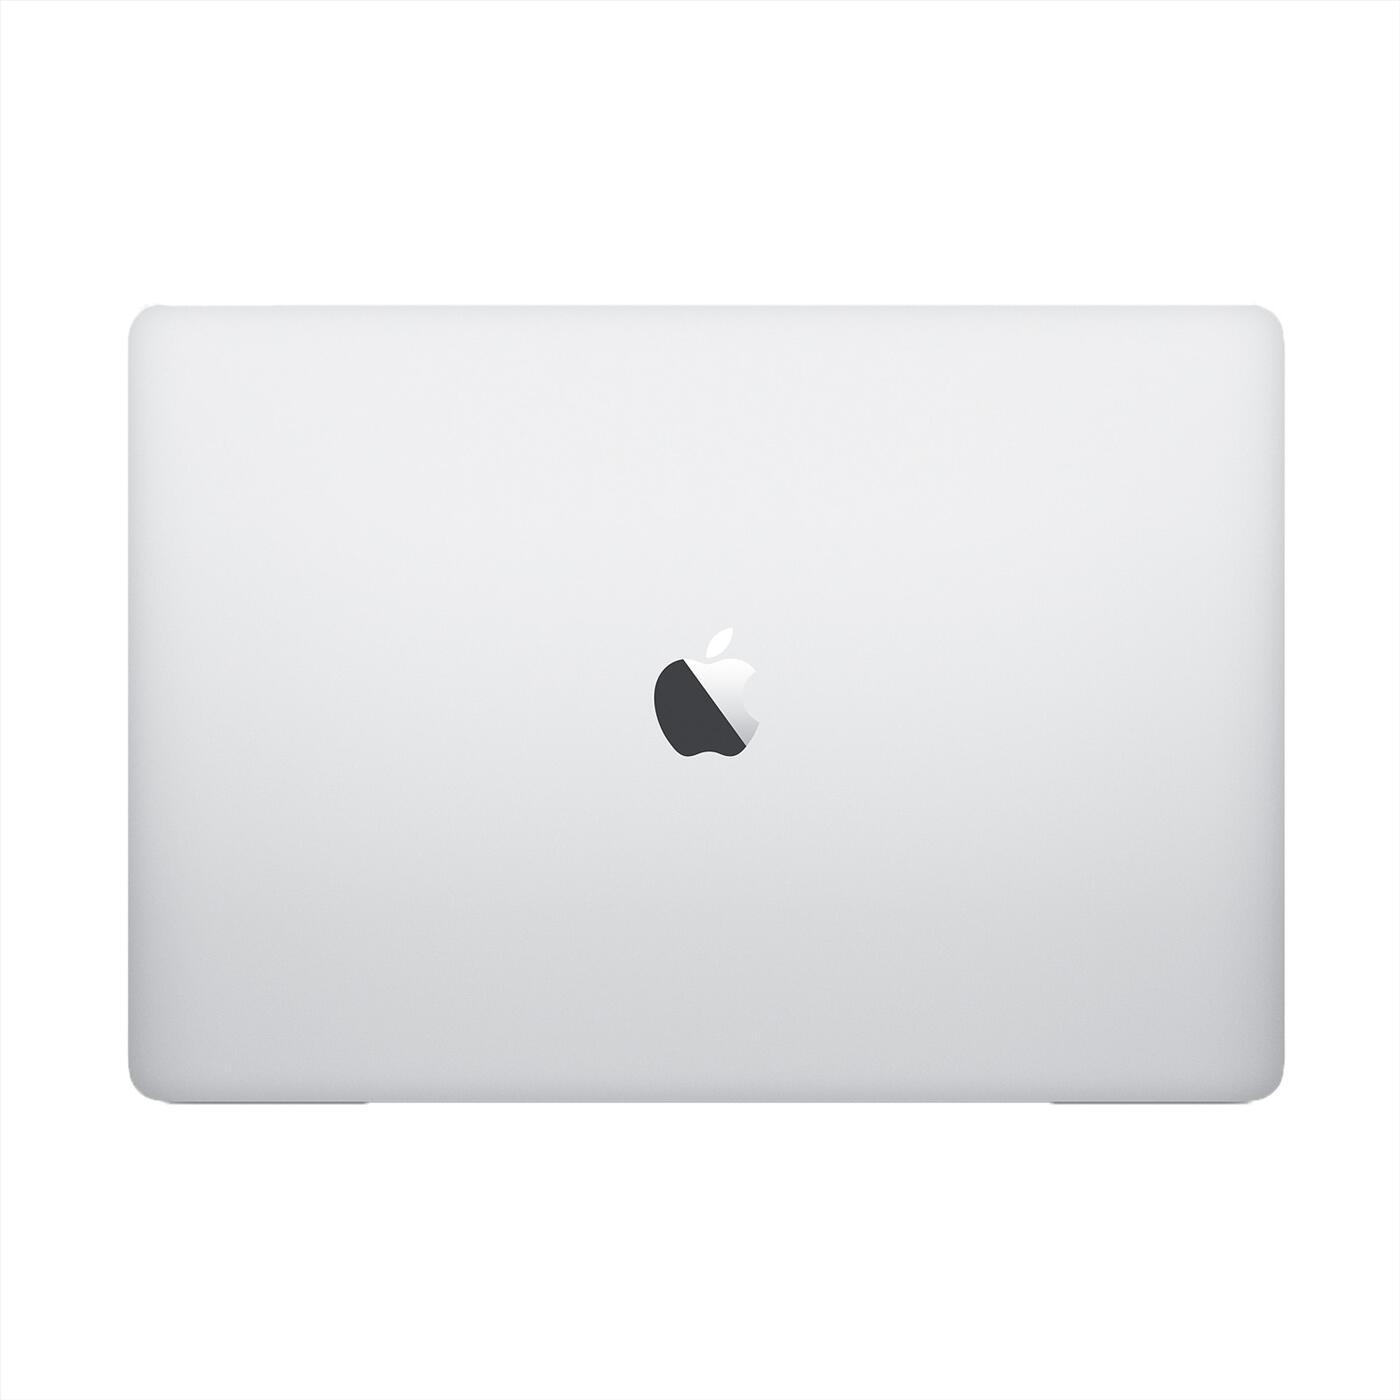 Macbook Pro 2018 MR972 (Core i7-8850H | Ram 16GB | SSD 512GB | 15.4 inch Retina | AMD 560X | Silver)